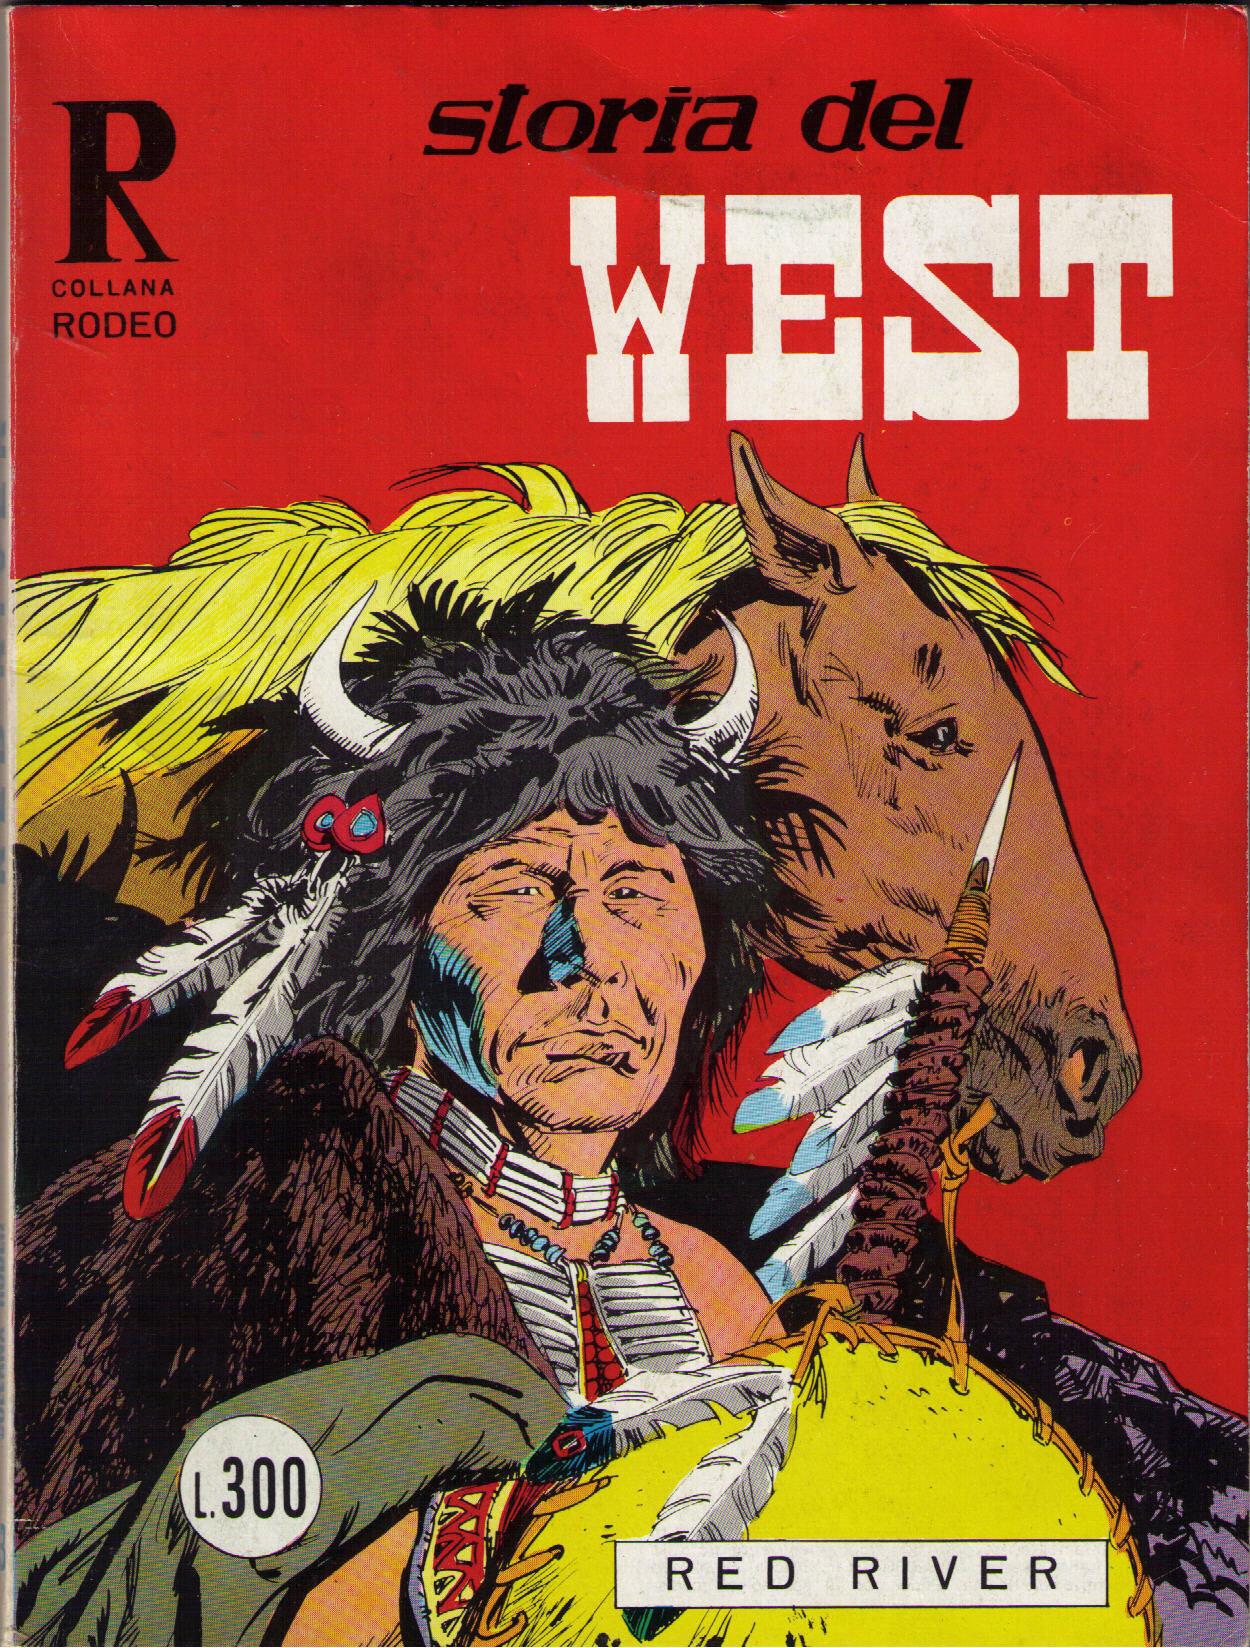 Storia del West n. 41 (Collana Rodeo n. 93)